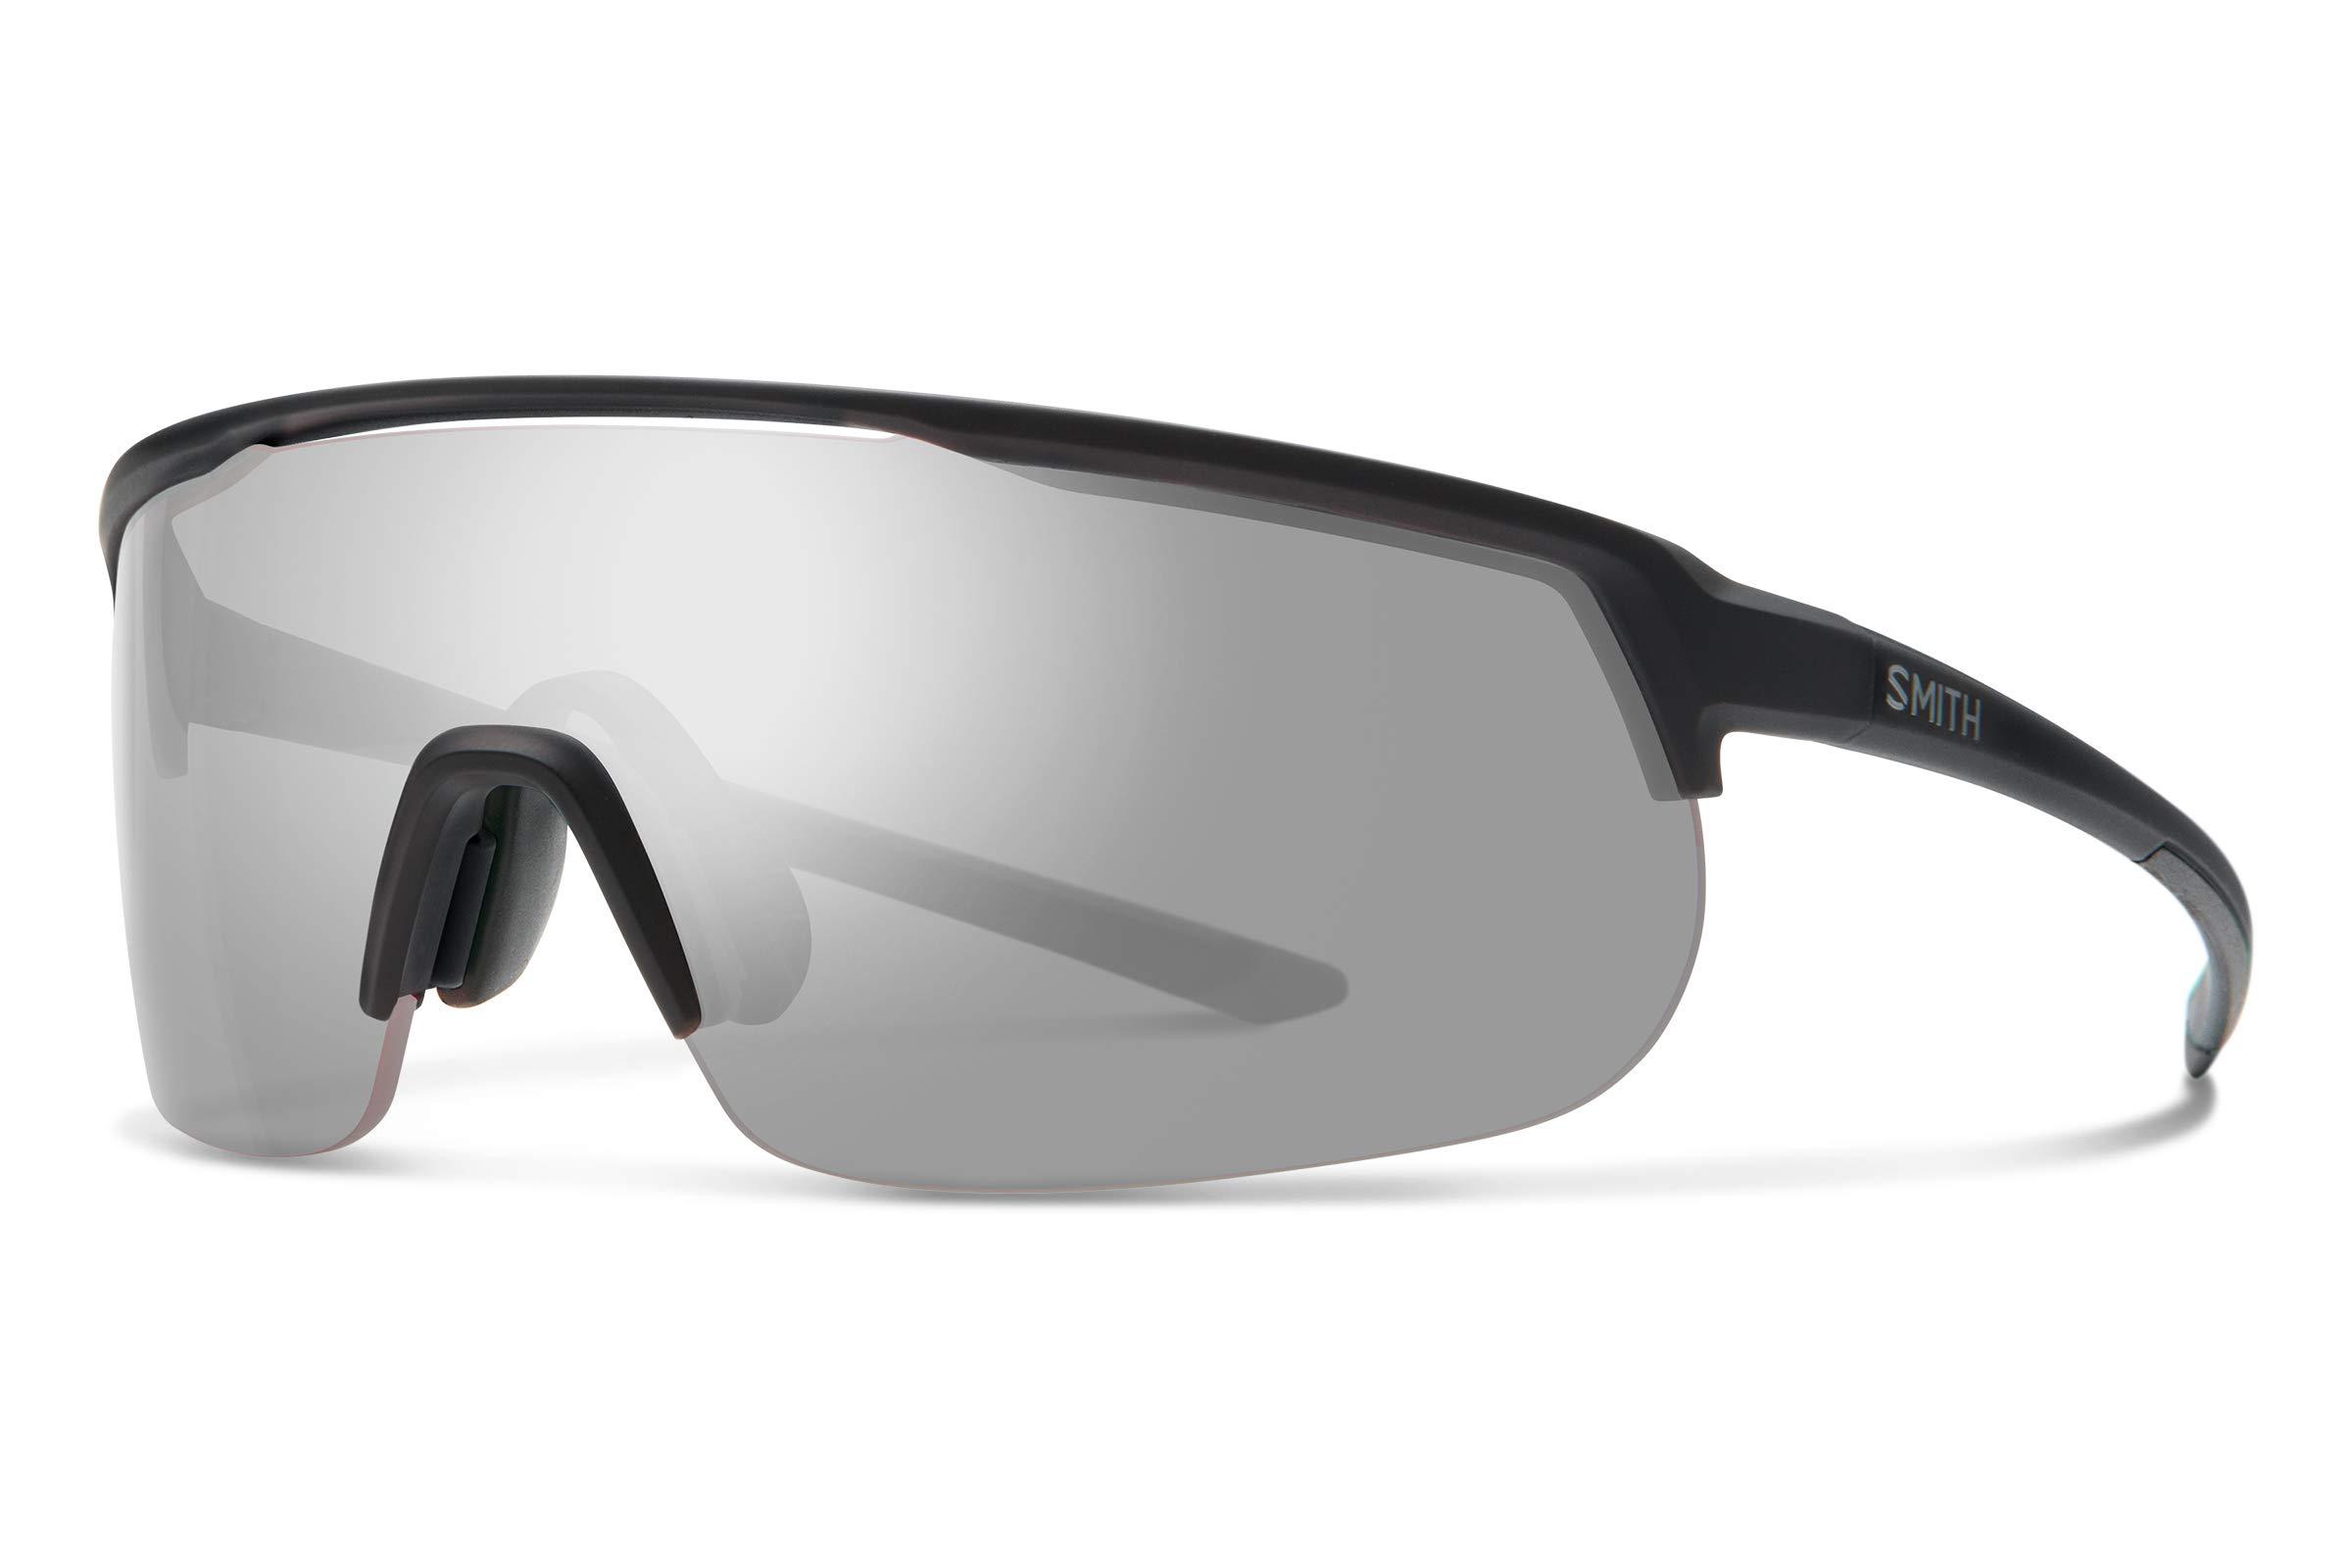 Smith Track Stand Chromapop Sunglasses, Matte Black, Chromapop Platinum/Contrast Rose